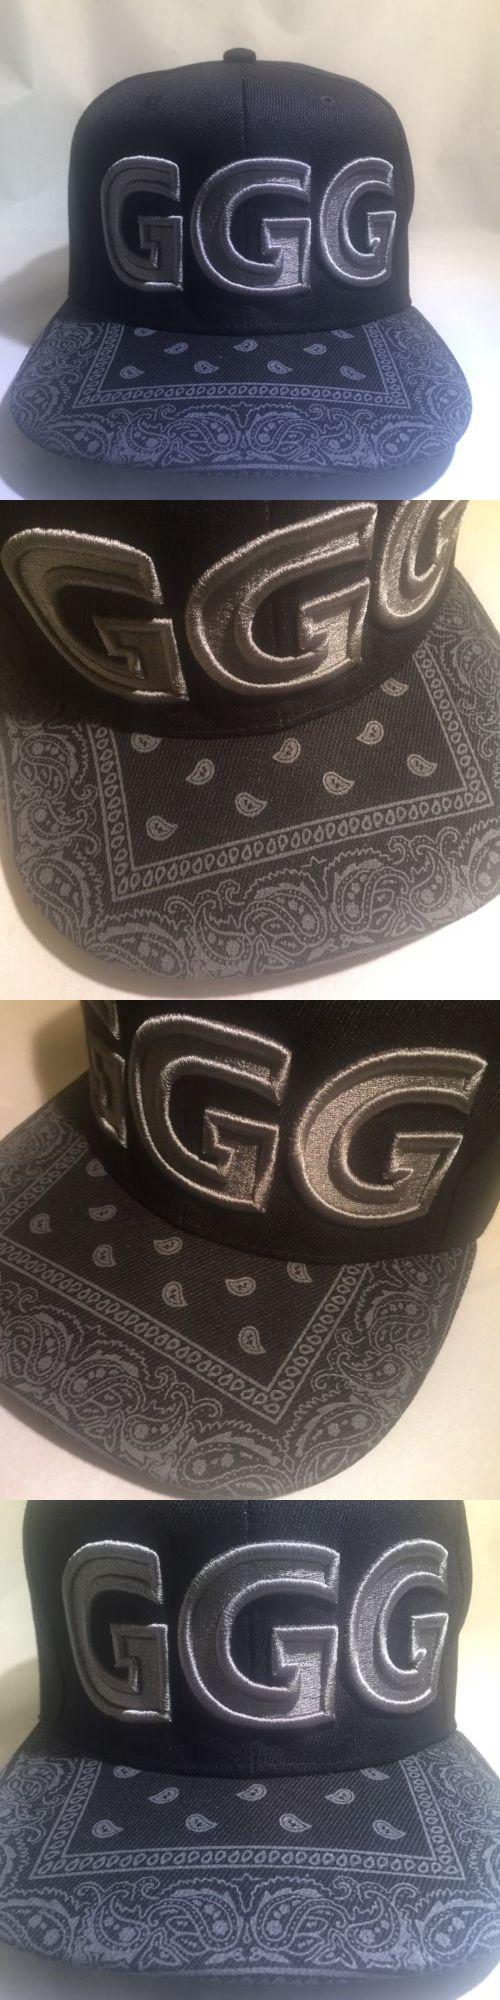 Headbands and Hats 179769: Ggg God Of War Canelo Alvarez Gennady Golovkin Boxing Hat Boxer Snapback Bandana -> BUY IT NOW ONLY: $34.99 on eBay!